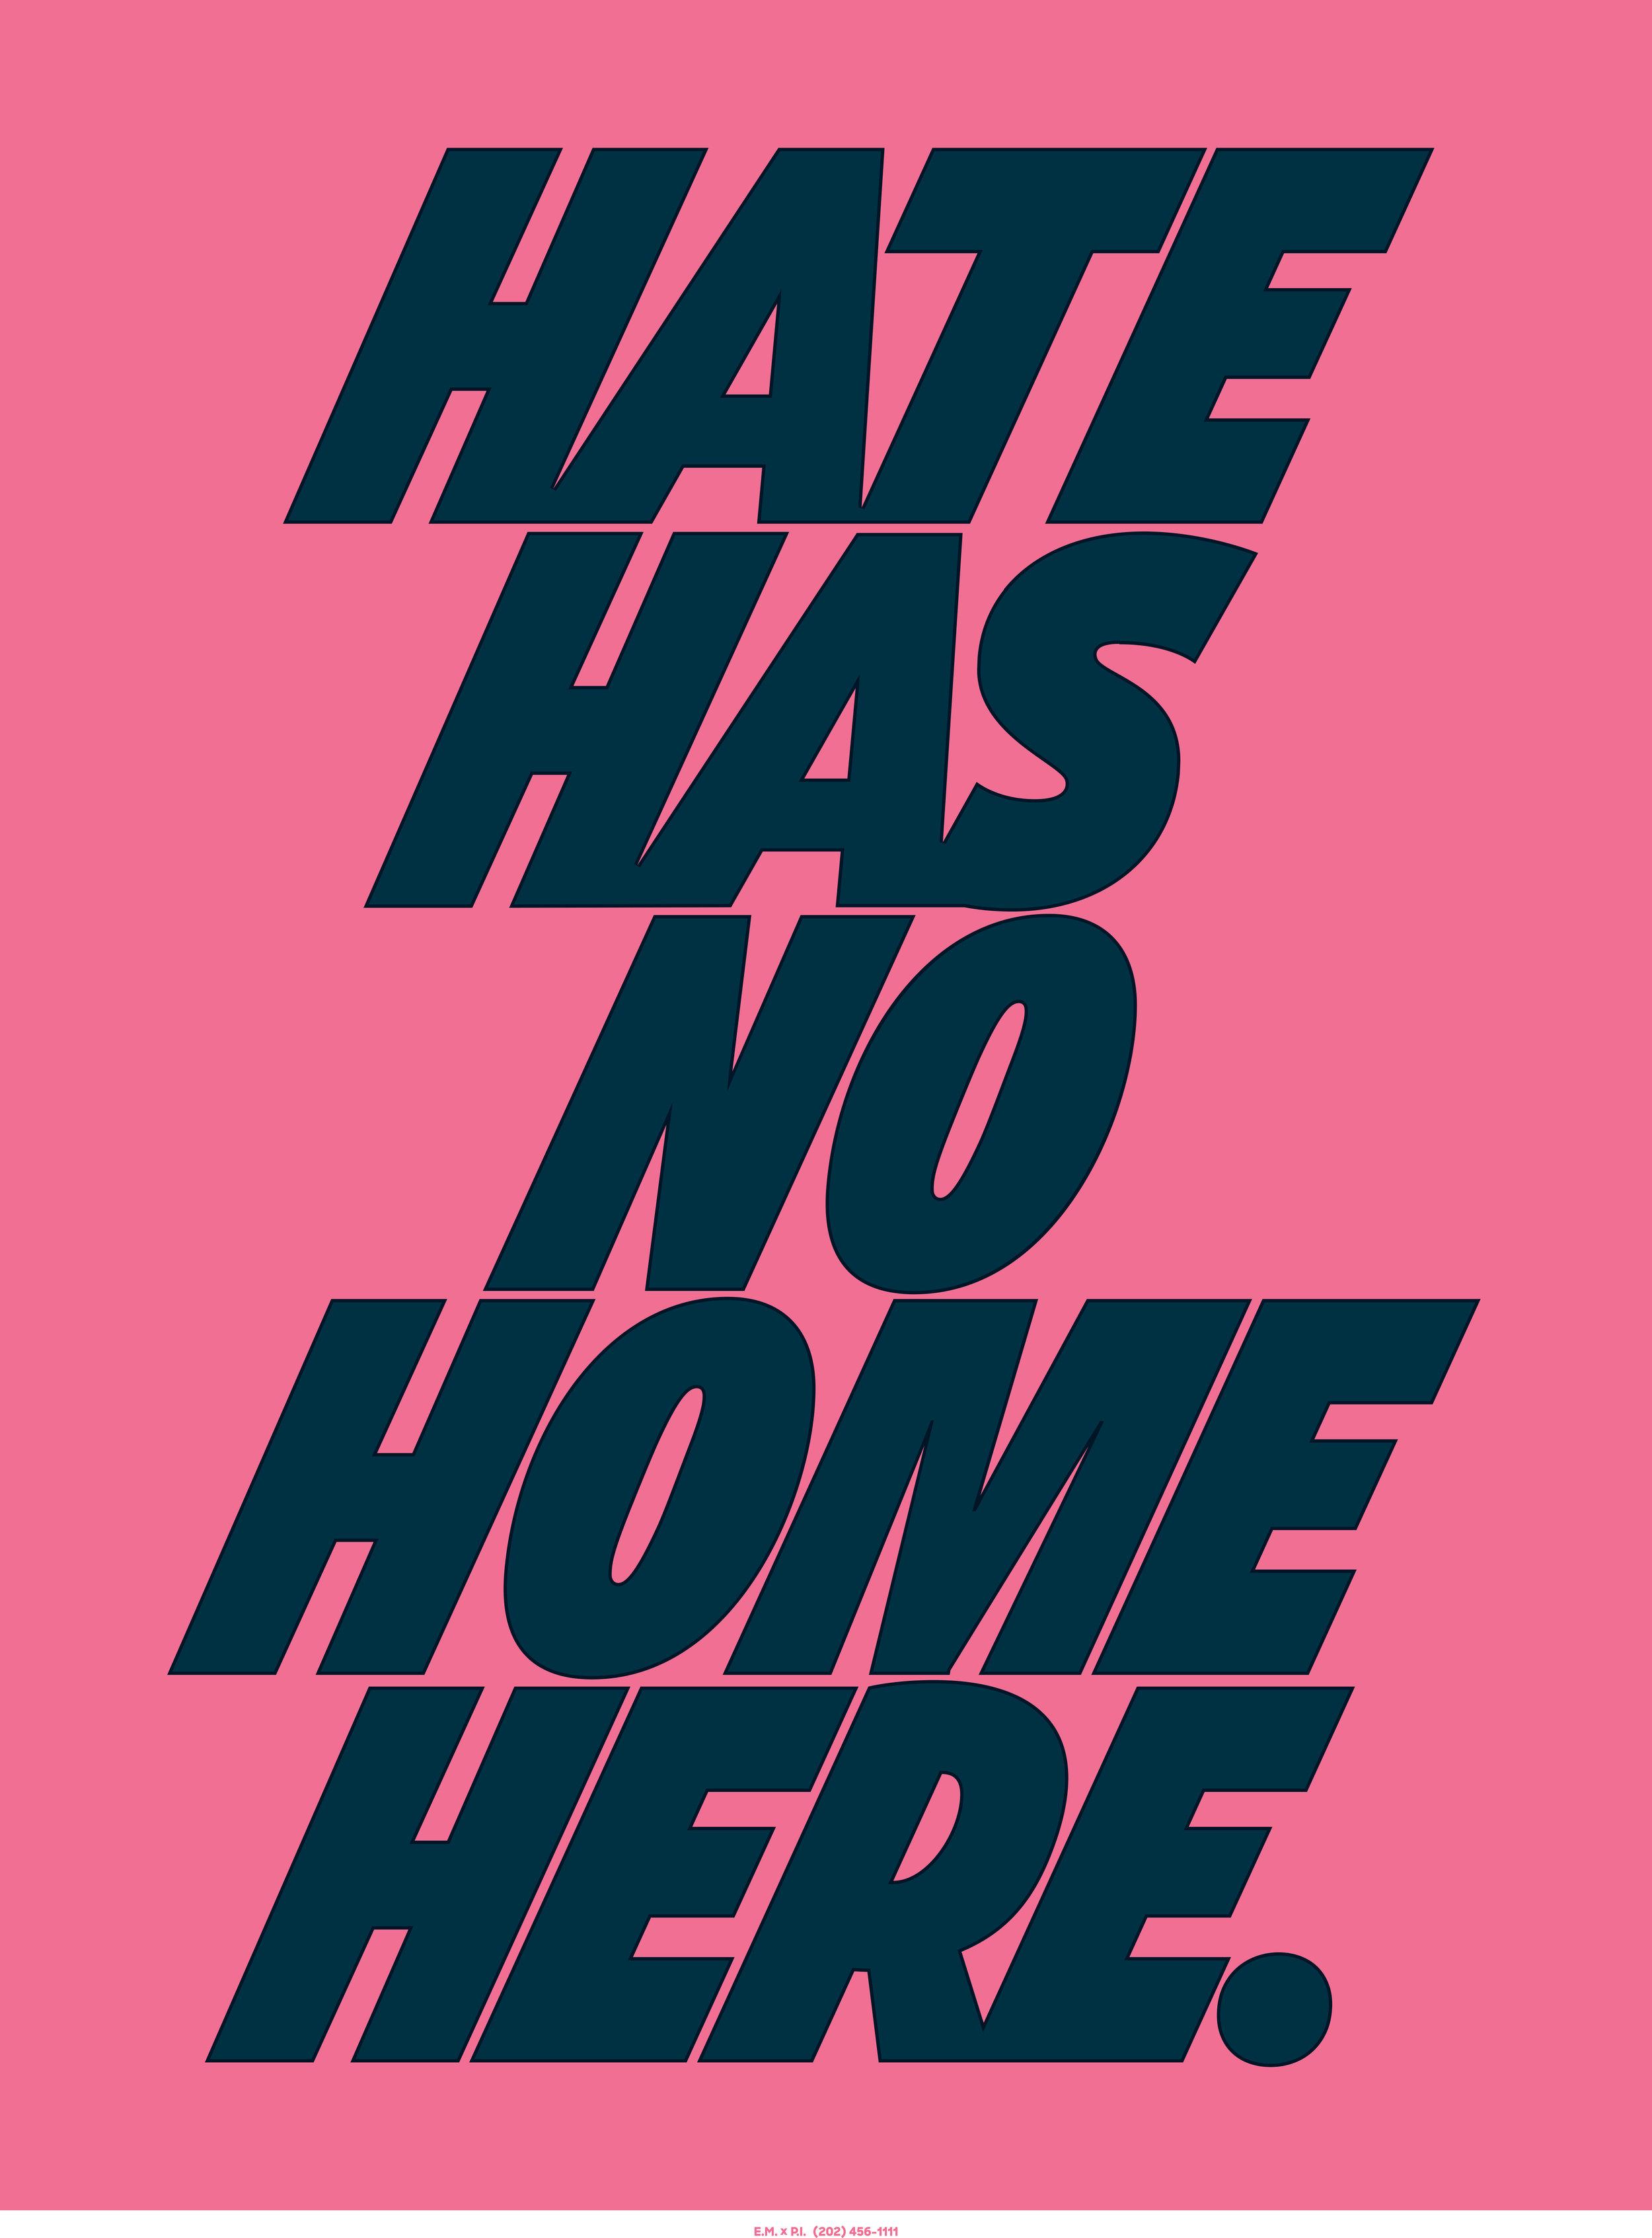 Marinovich Hate Has No Home Here Artwork